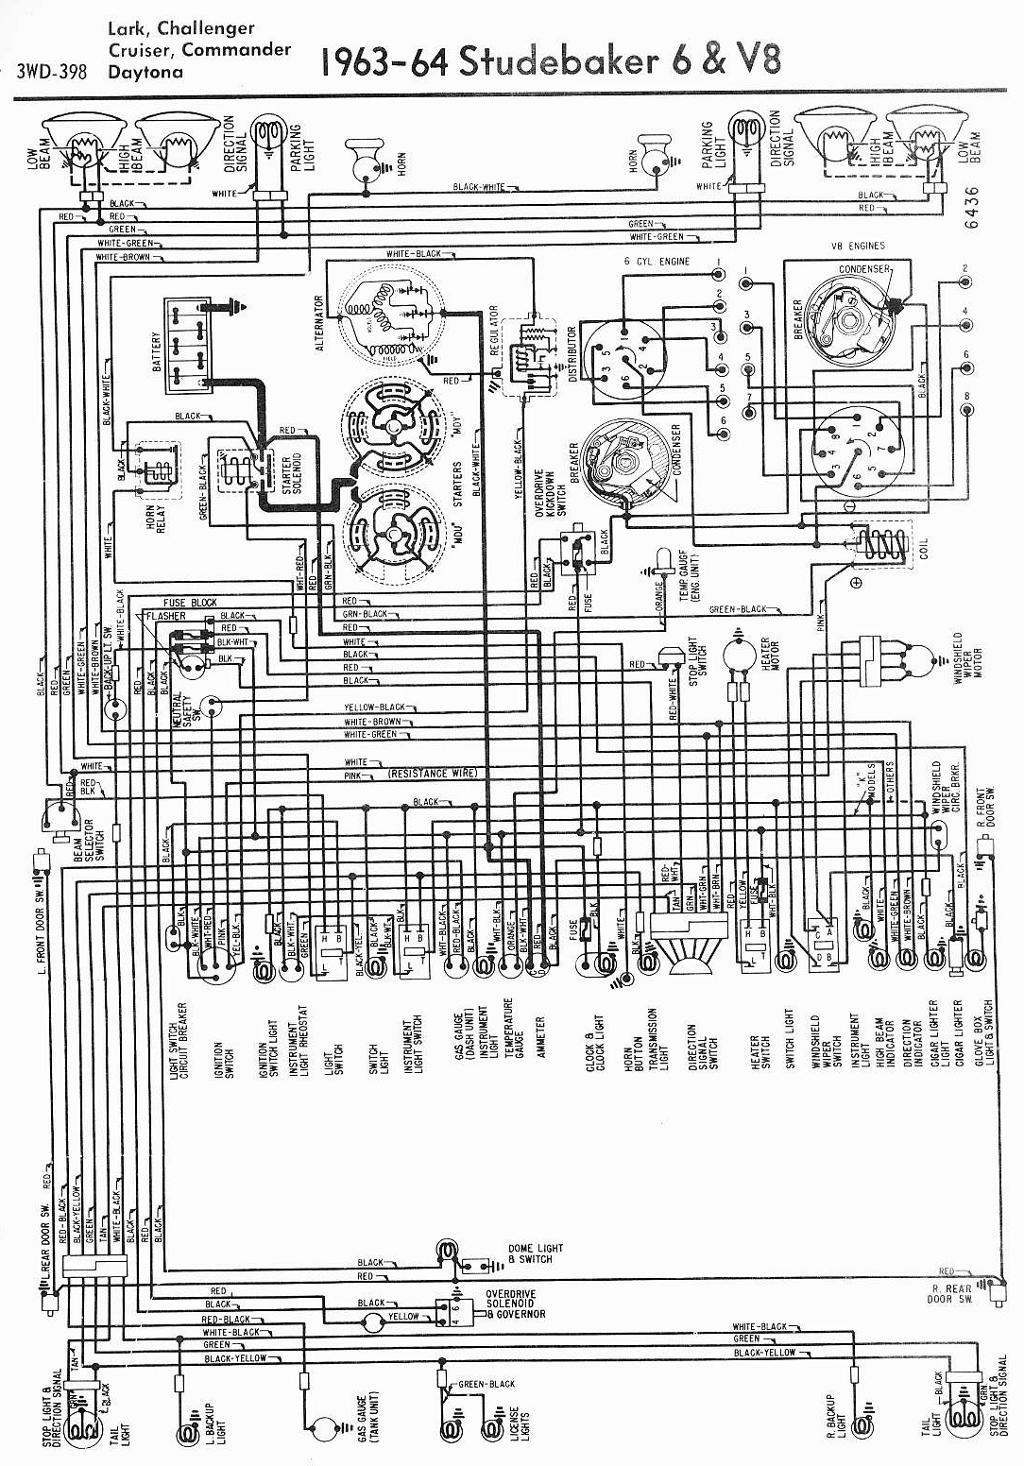 studebaker car manuals wiring diagrams pdf fault codes rh automotive manuals net Ferrari 599 GTB Fiorano Ferrari 458 Italia